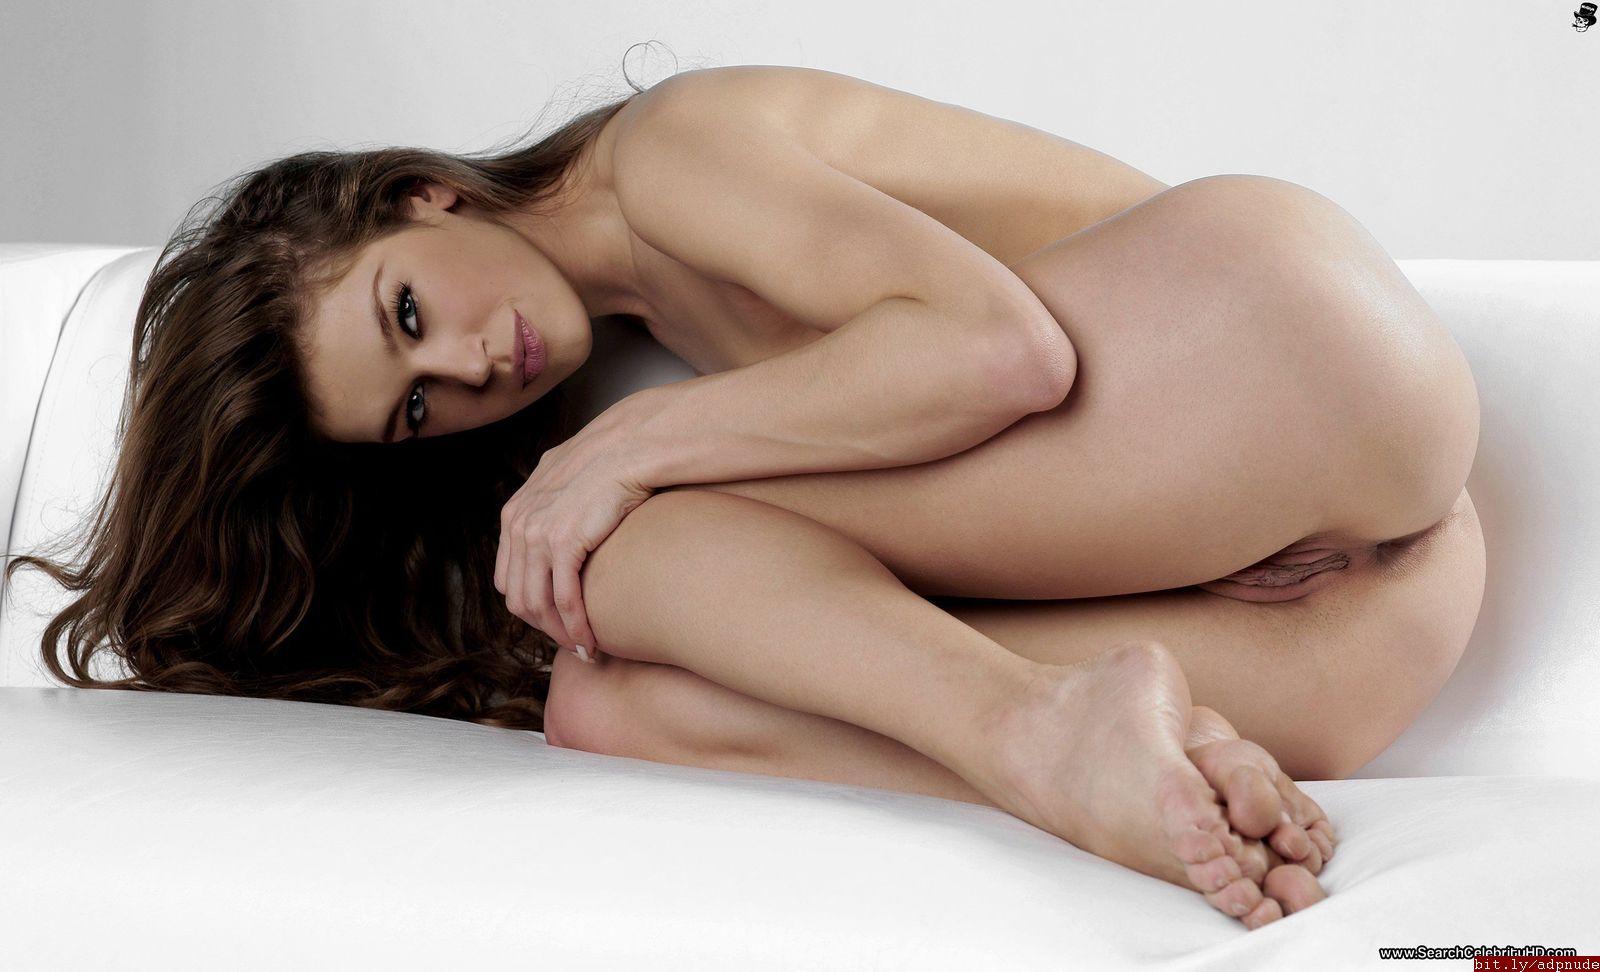 adrianne palecki nude